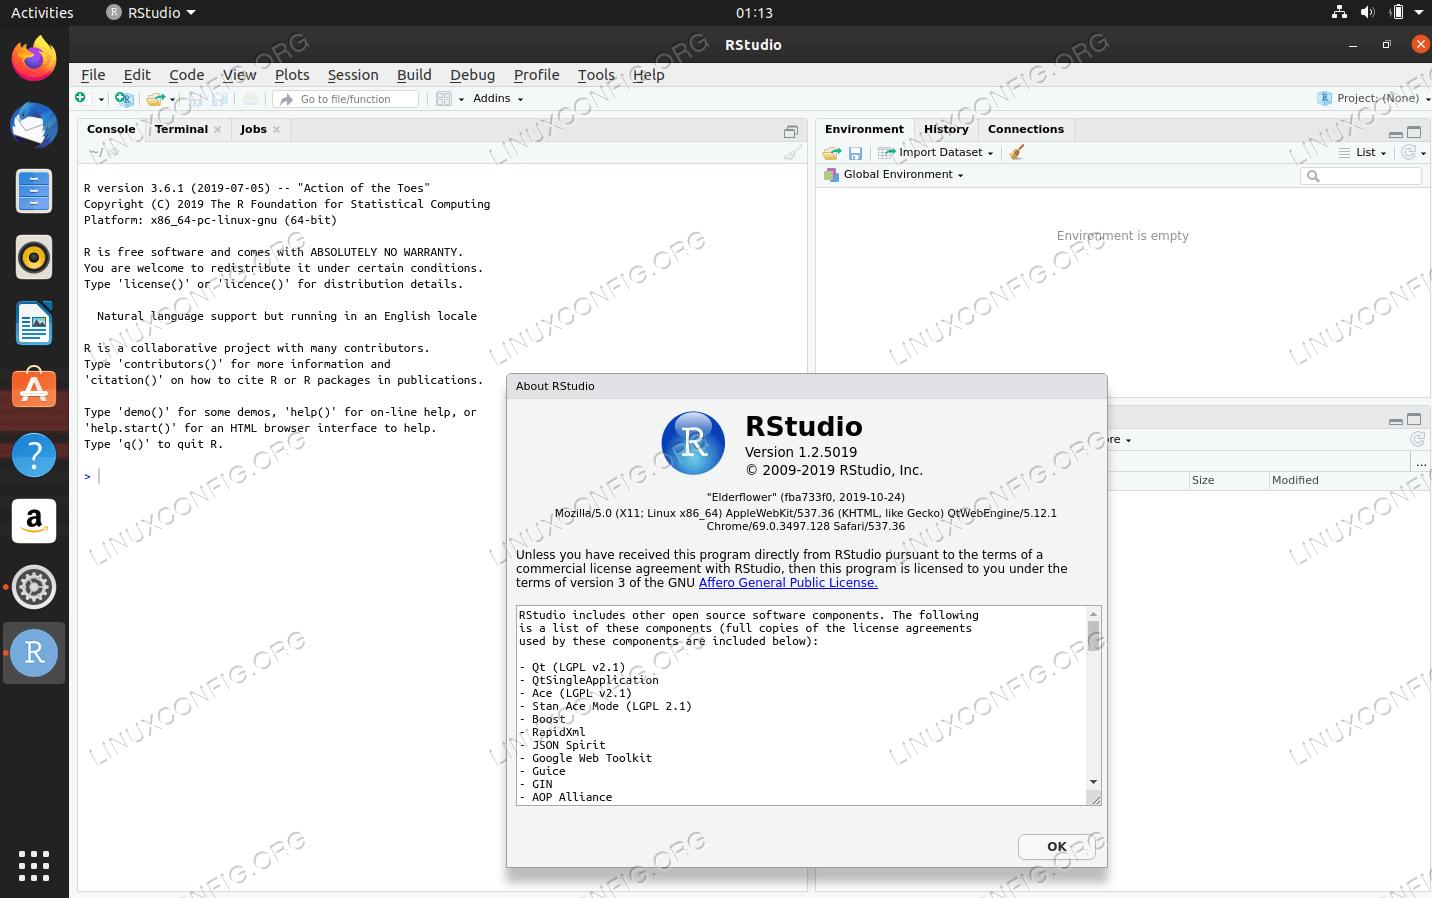 RStudio on Ubuntu 20.04 Focal Fossa Linux